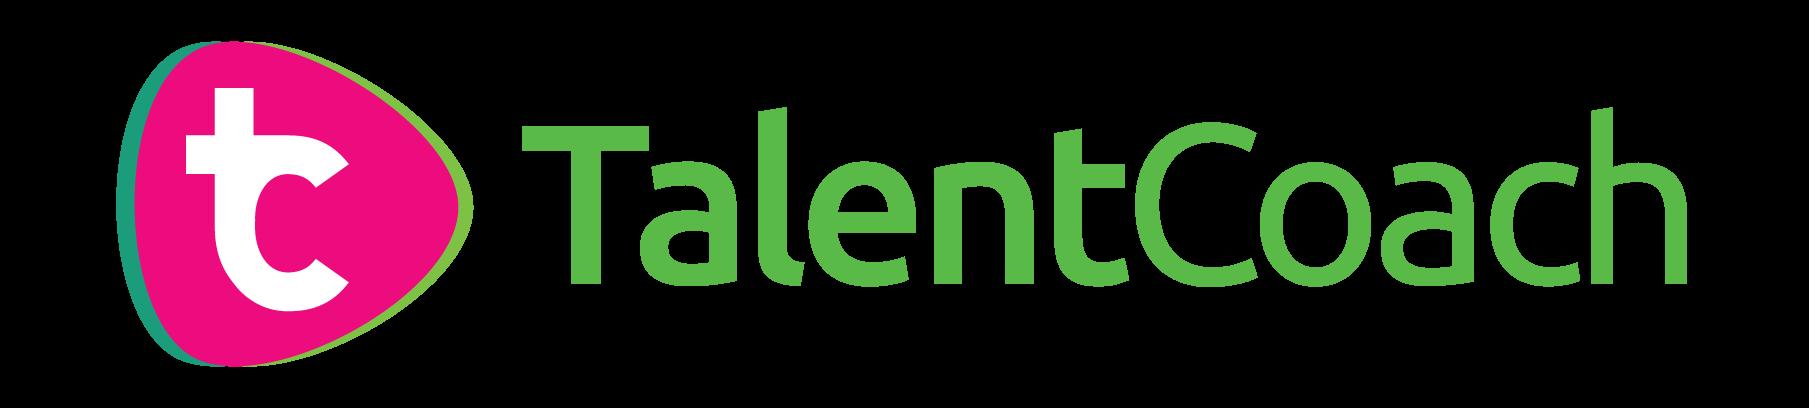 TalentCoach